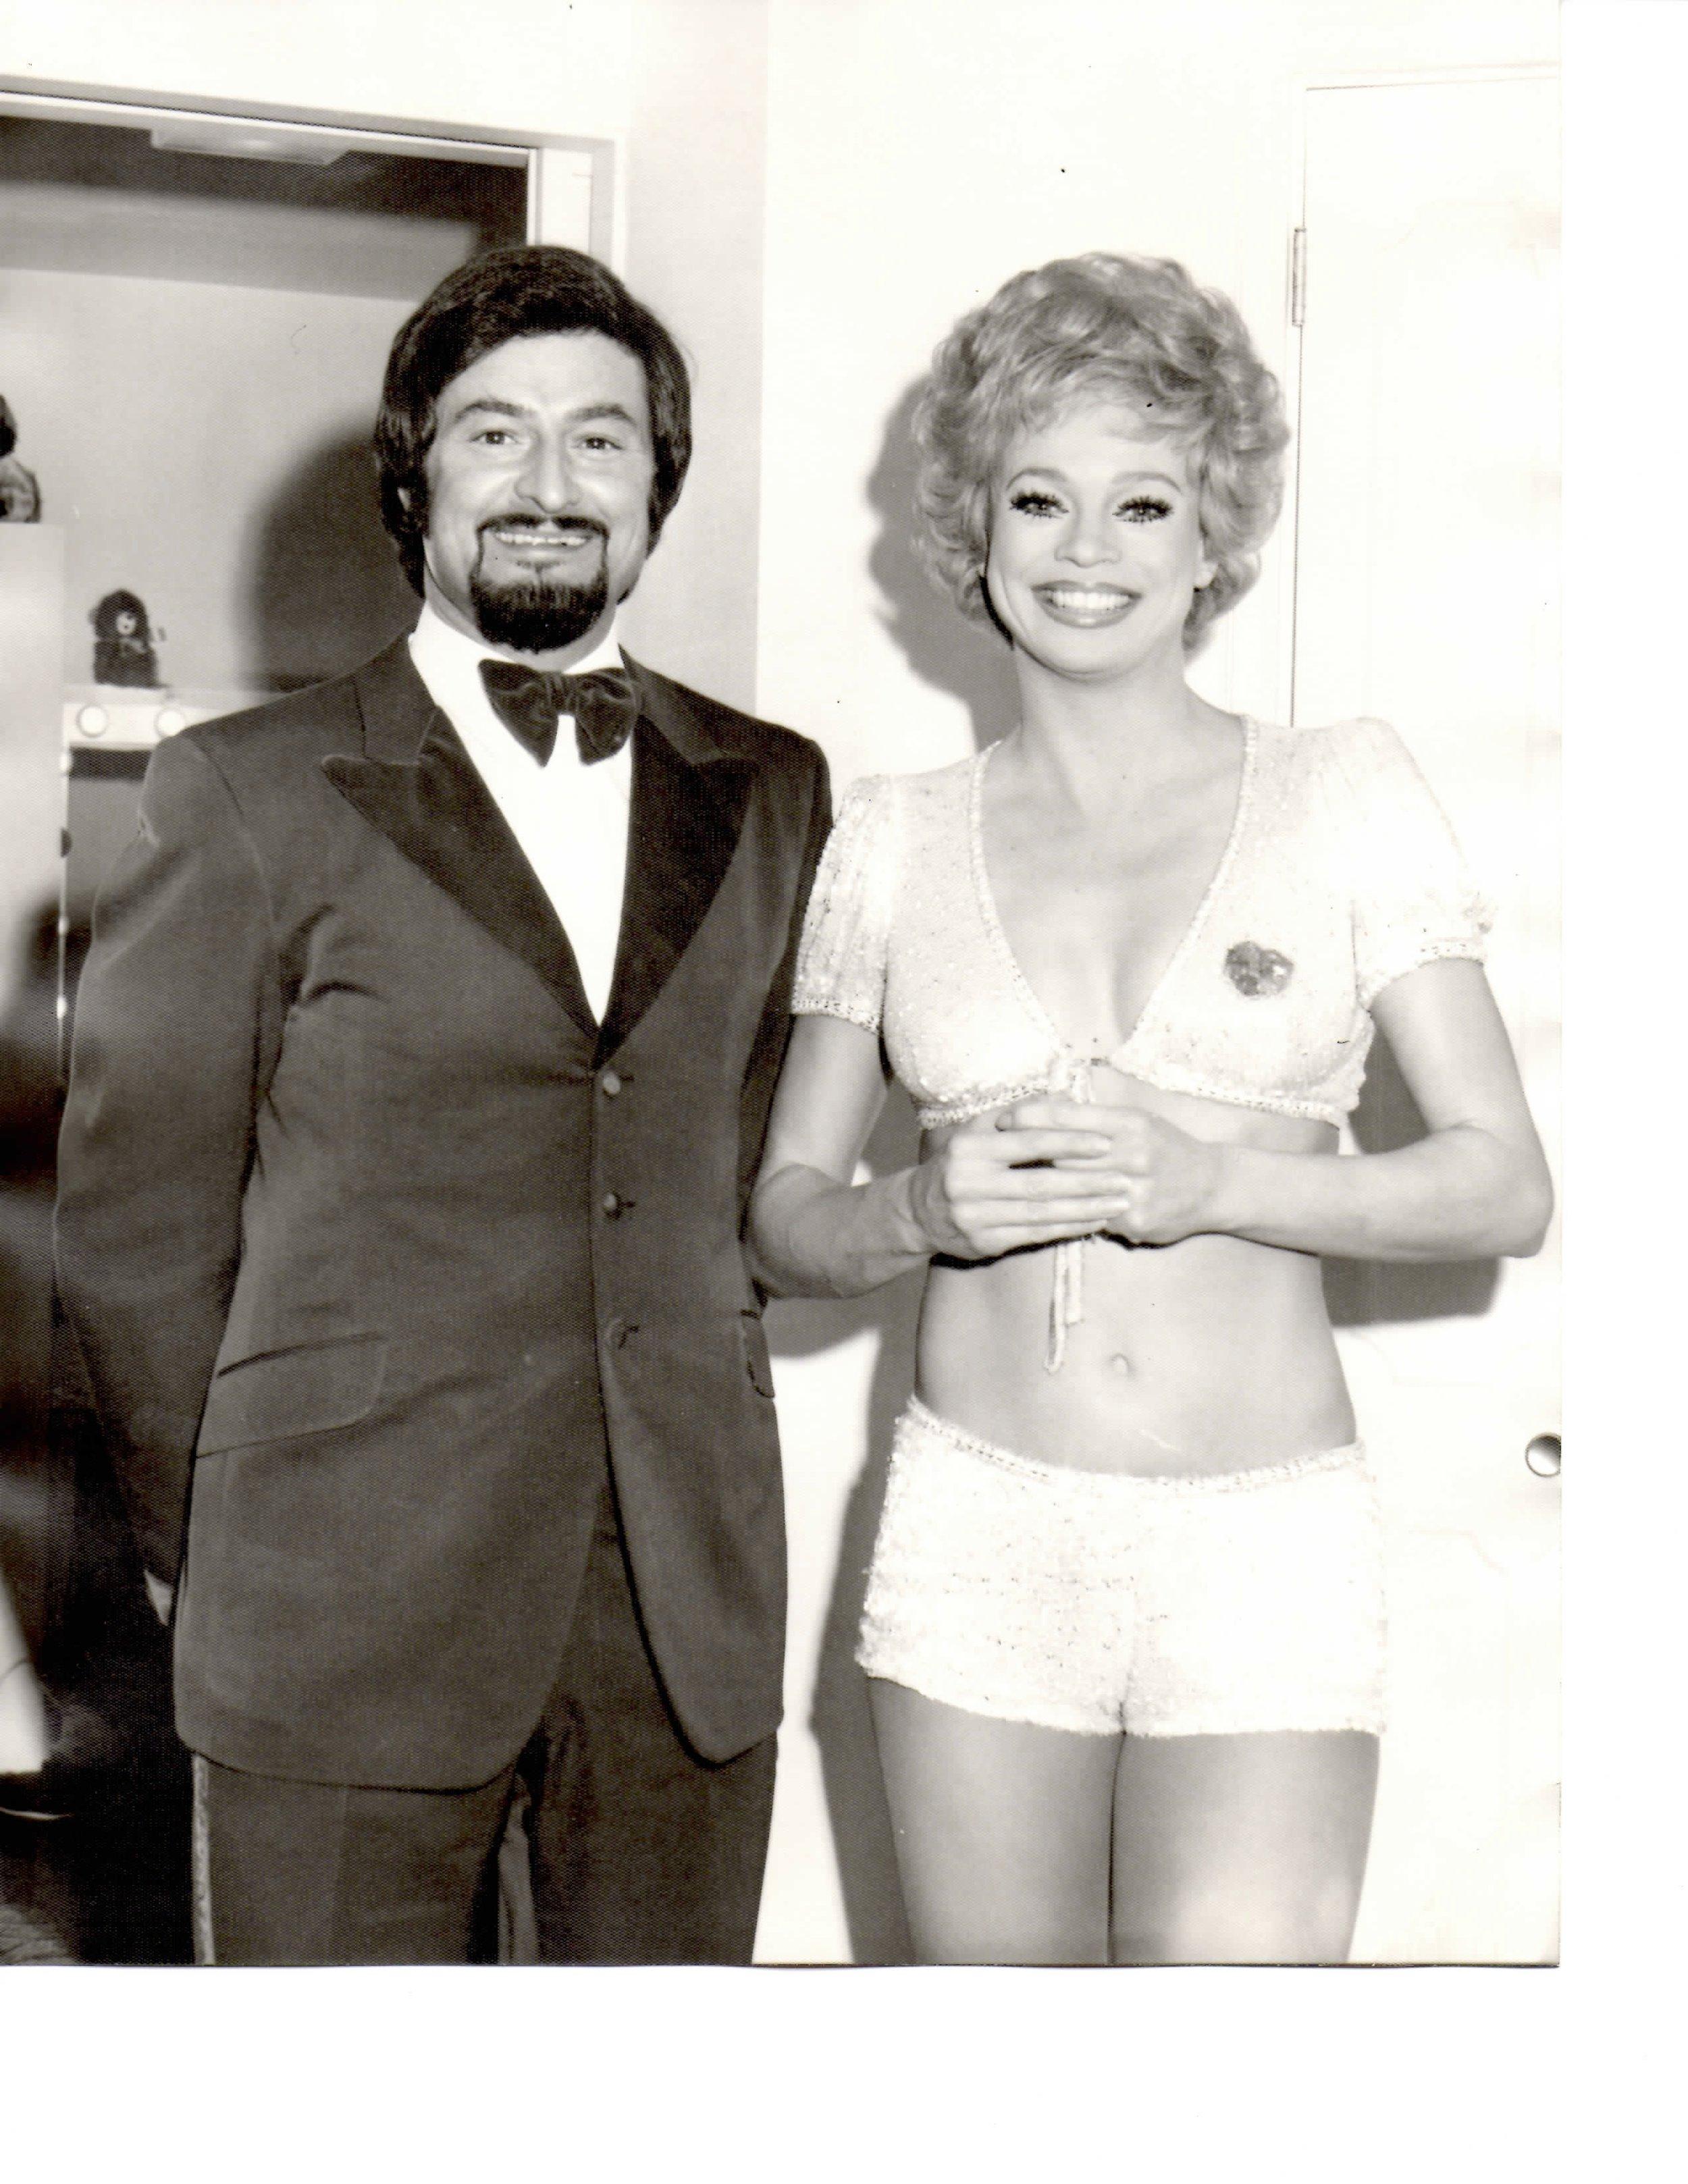 Georges & Juliet Prowse - 1975